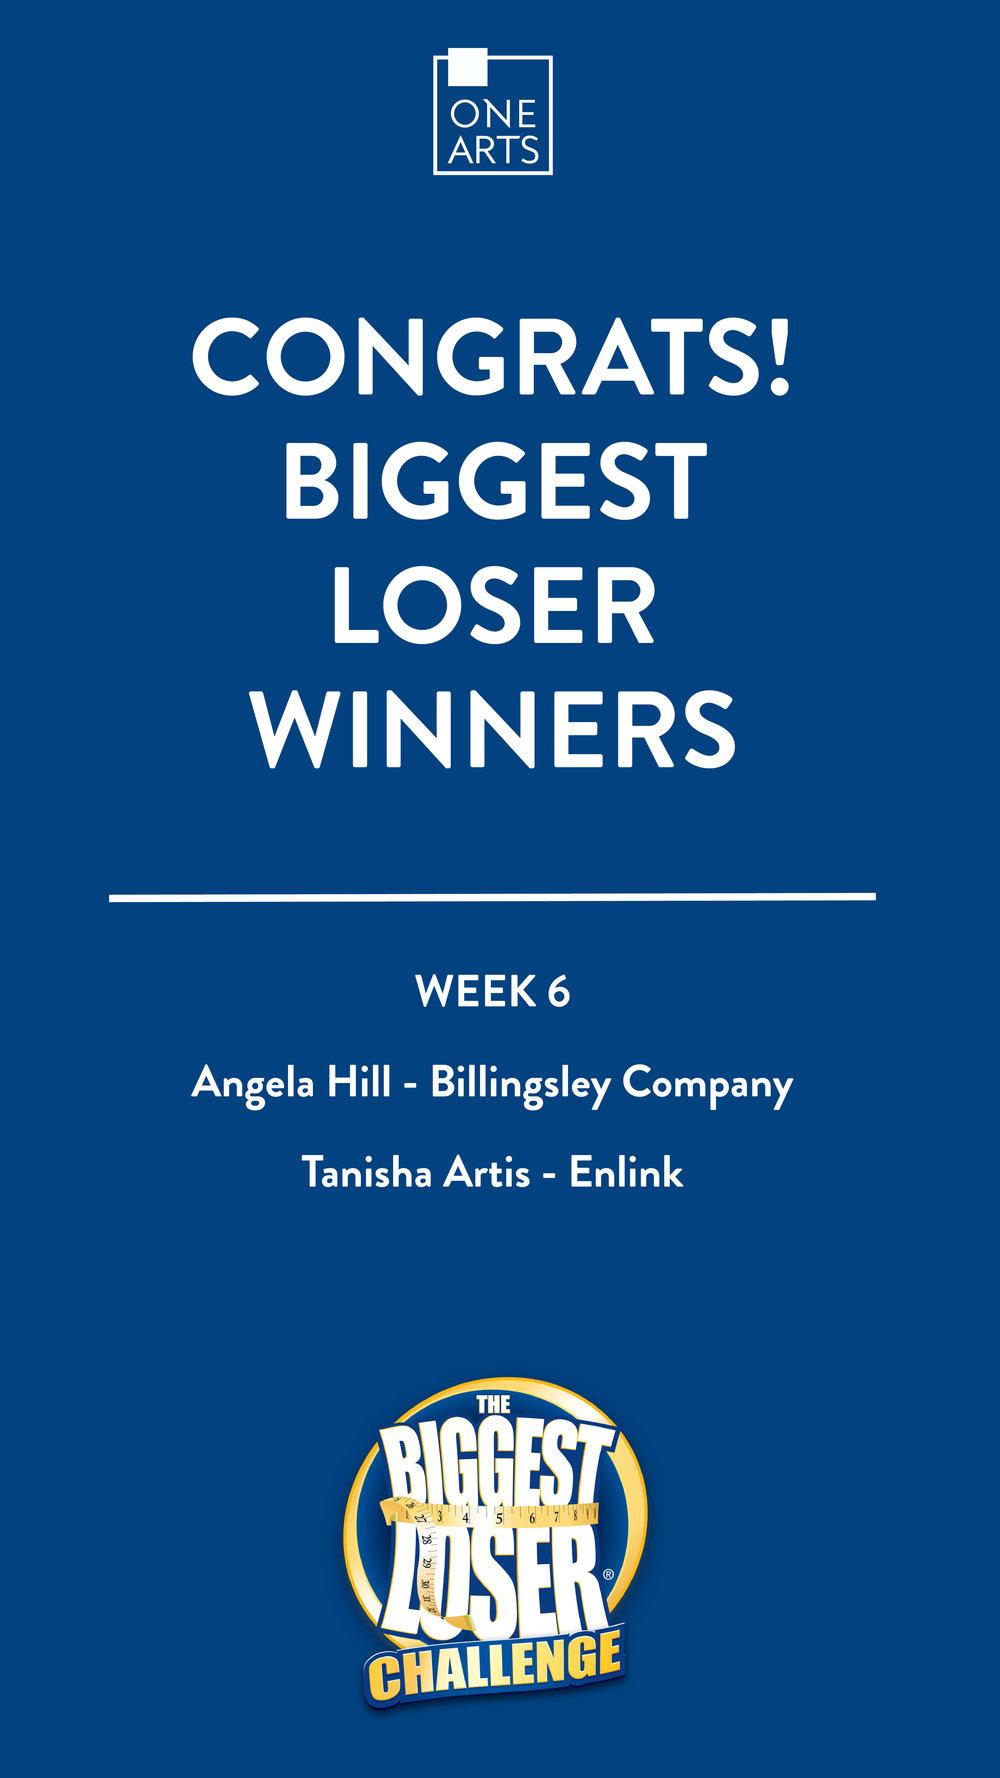 Biggest Loser Congrats Digital Sign wk6.jpg